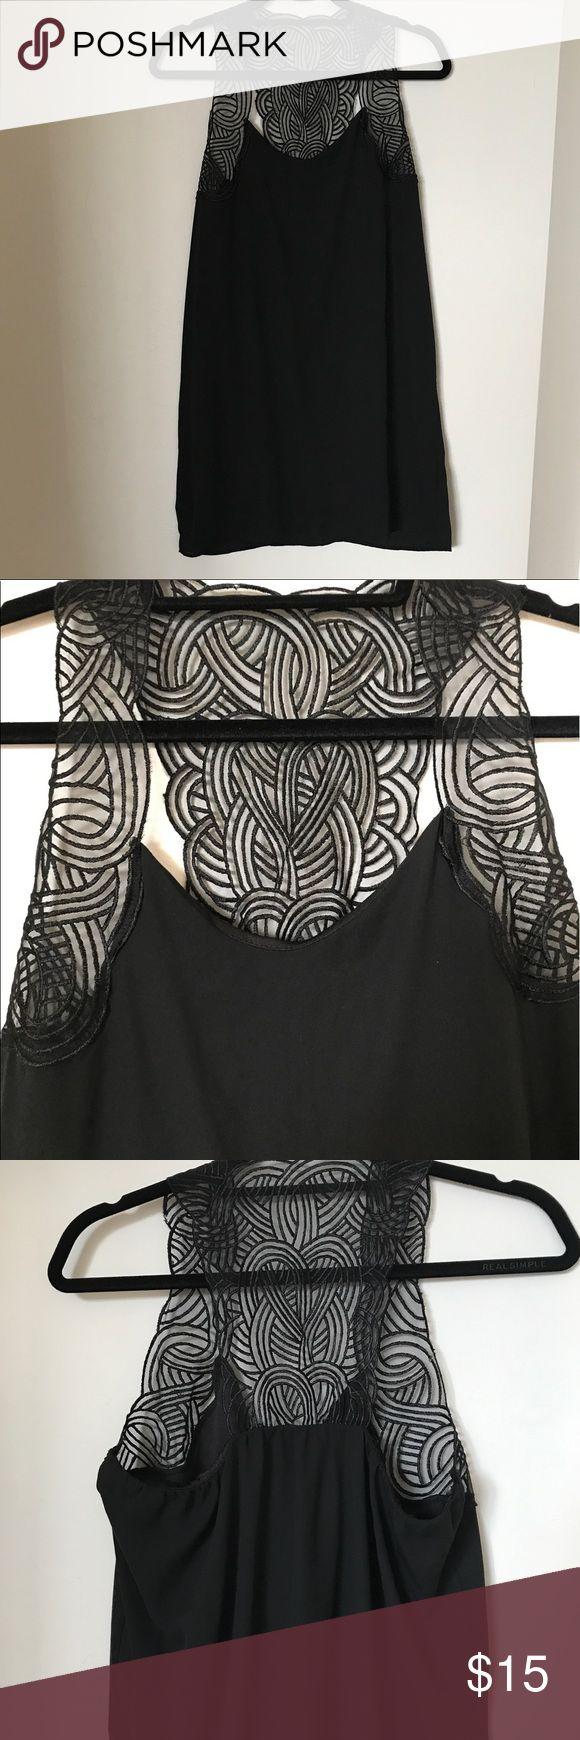 Black shift dress Black shift dress with lace detail Francesca's Collections Dresses Mini